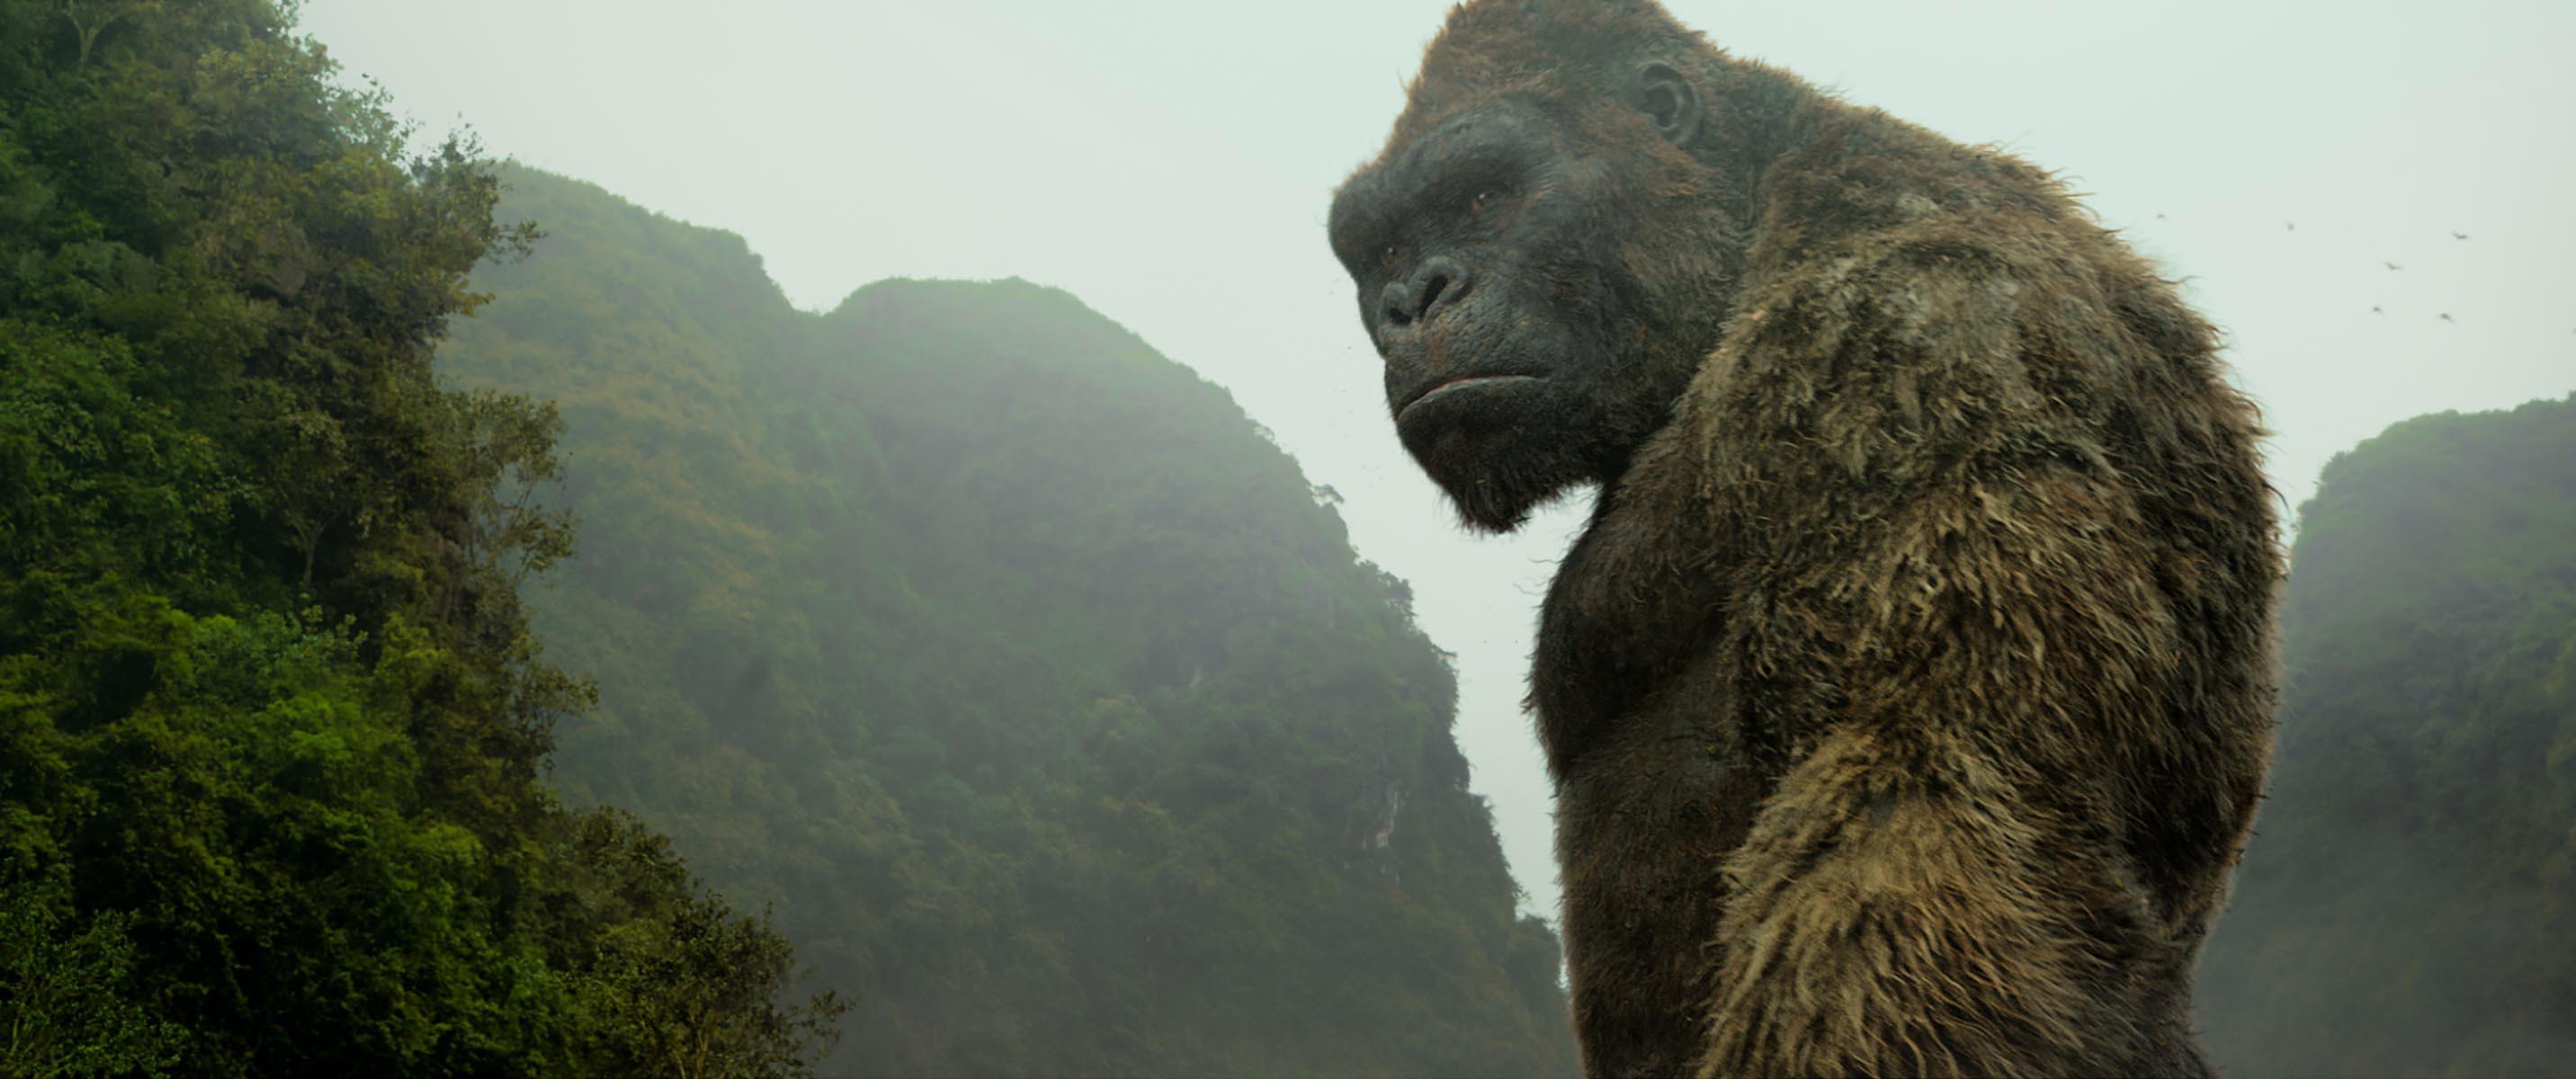 Kong: Skull Island